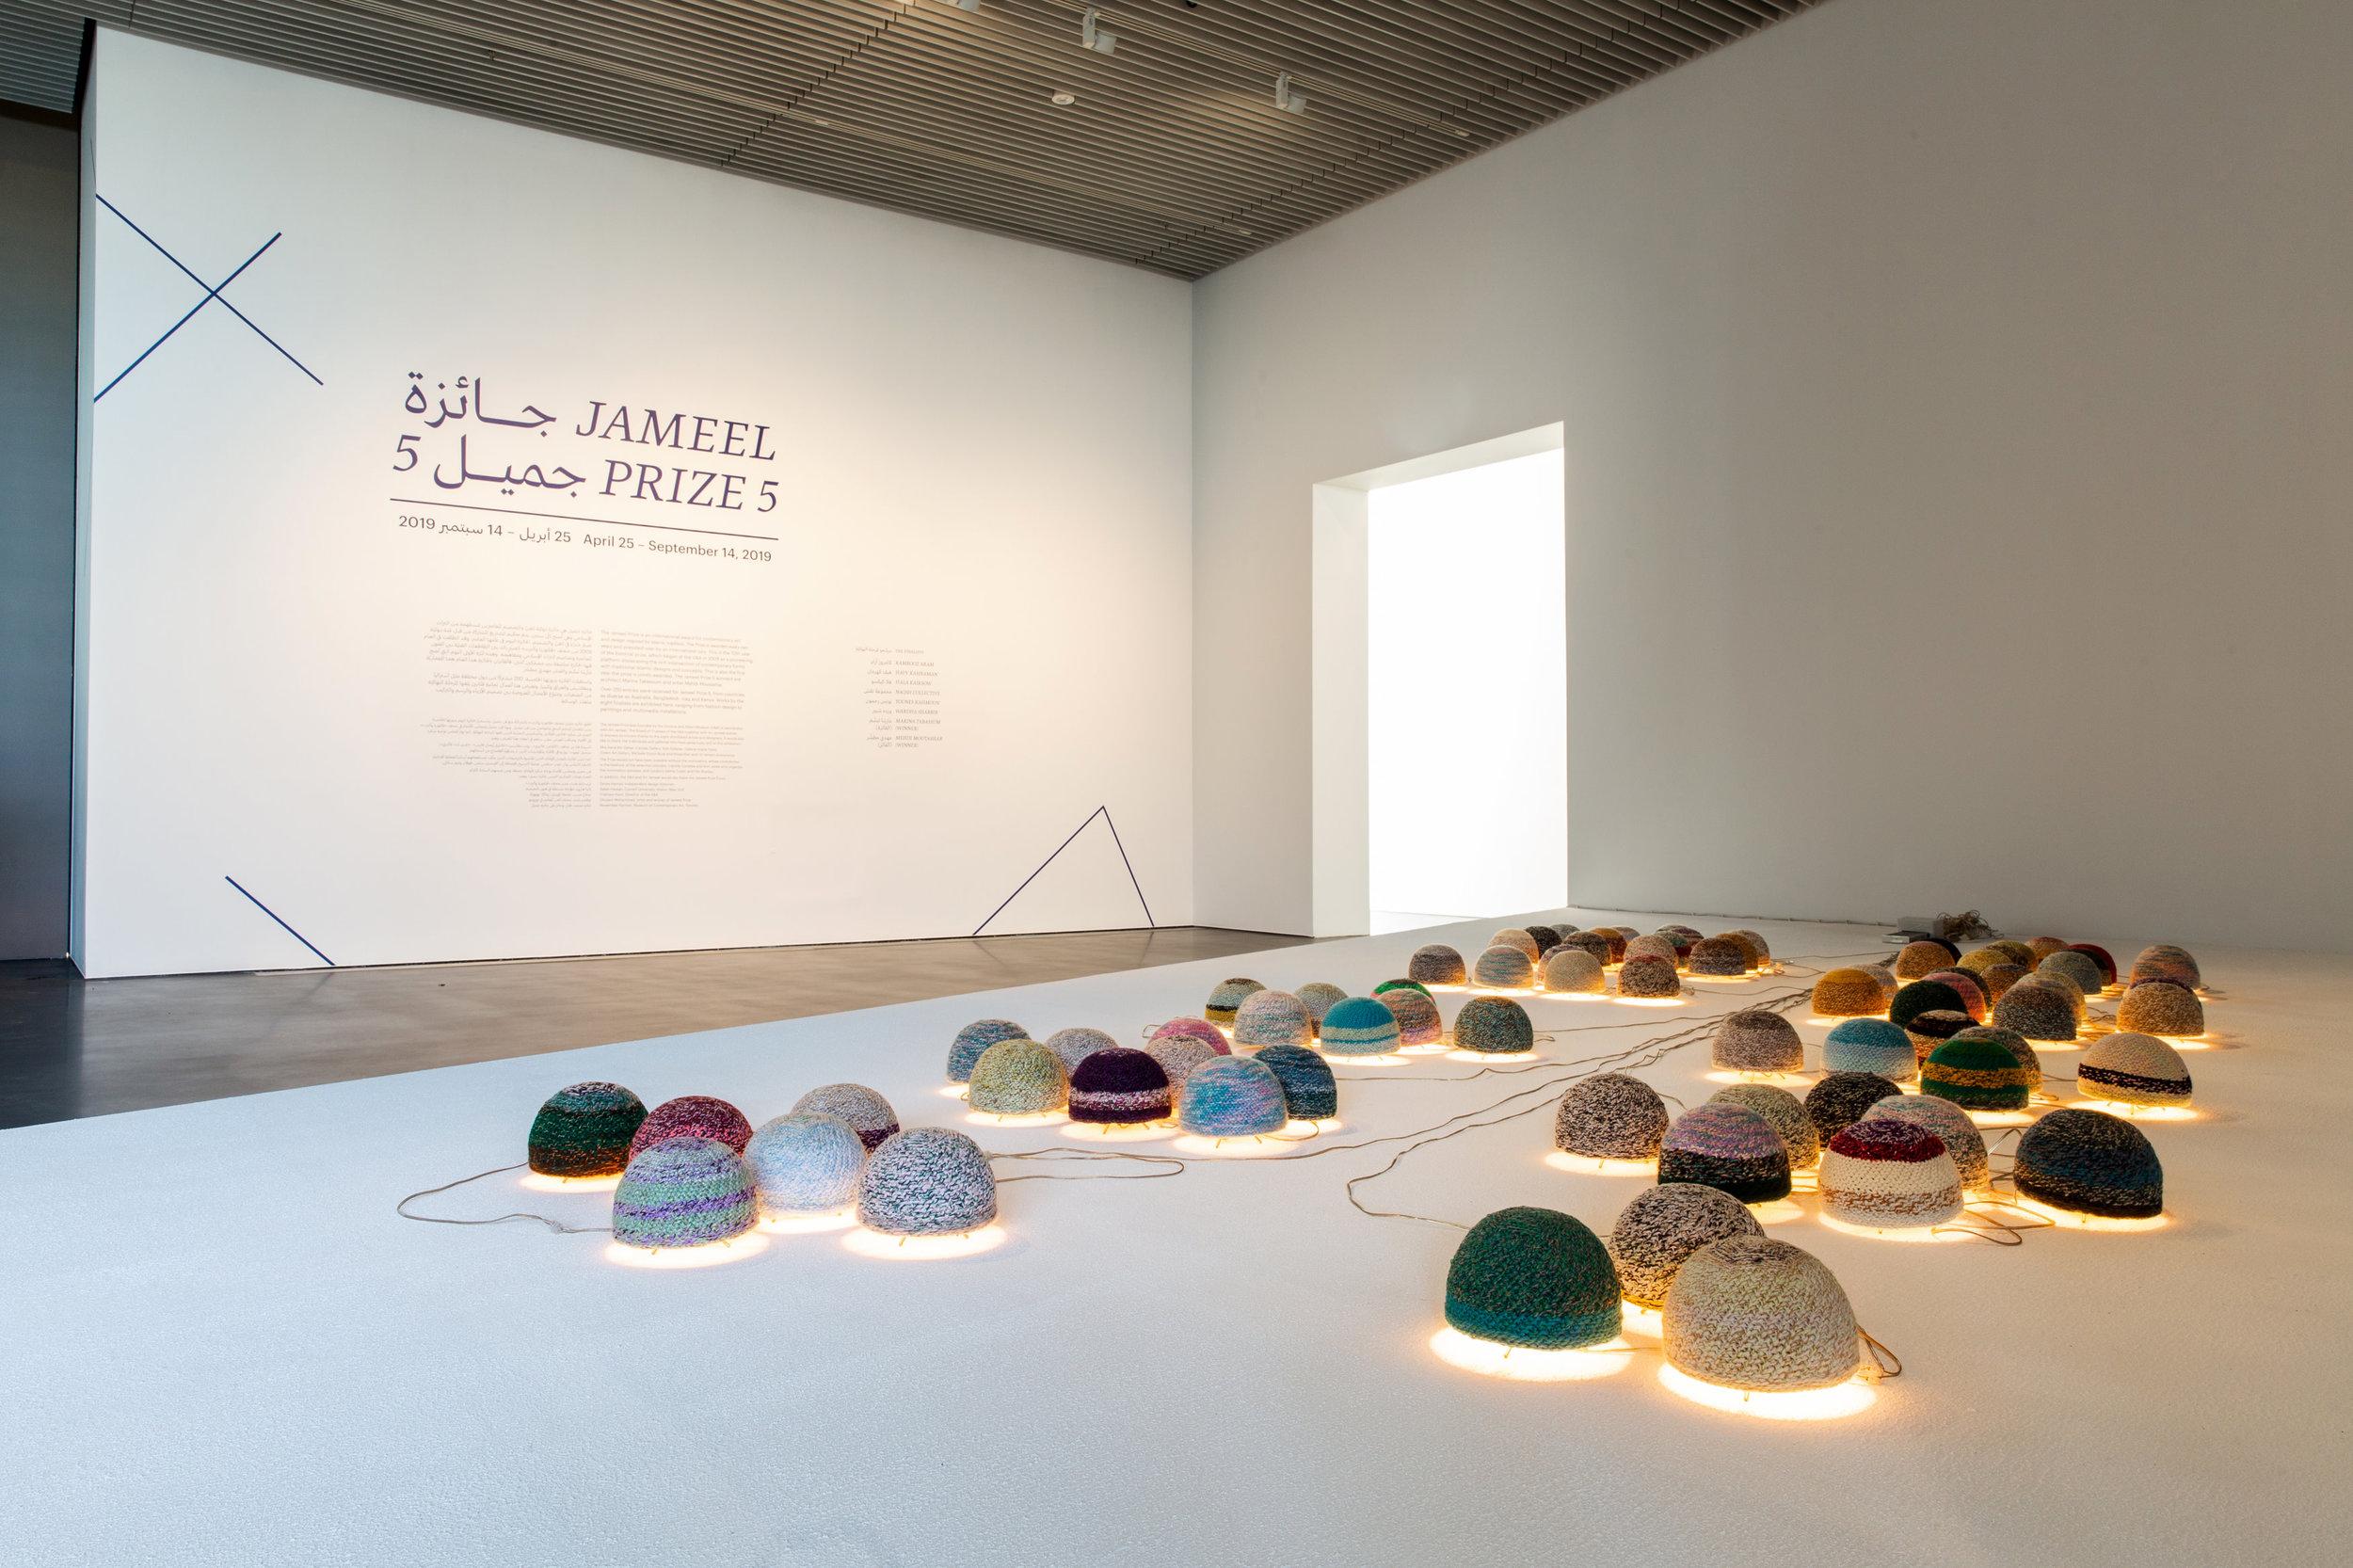 Jameel Prize 5